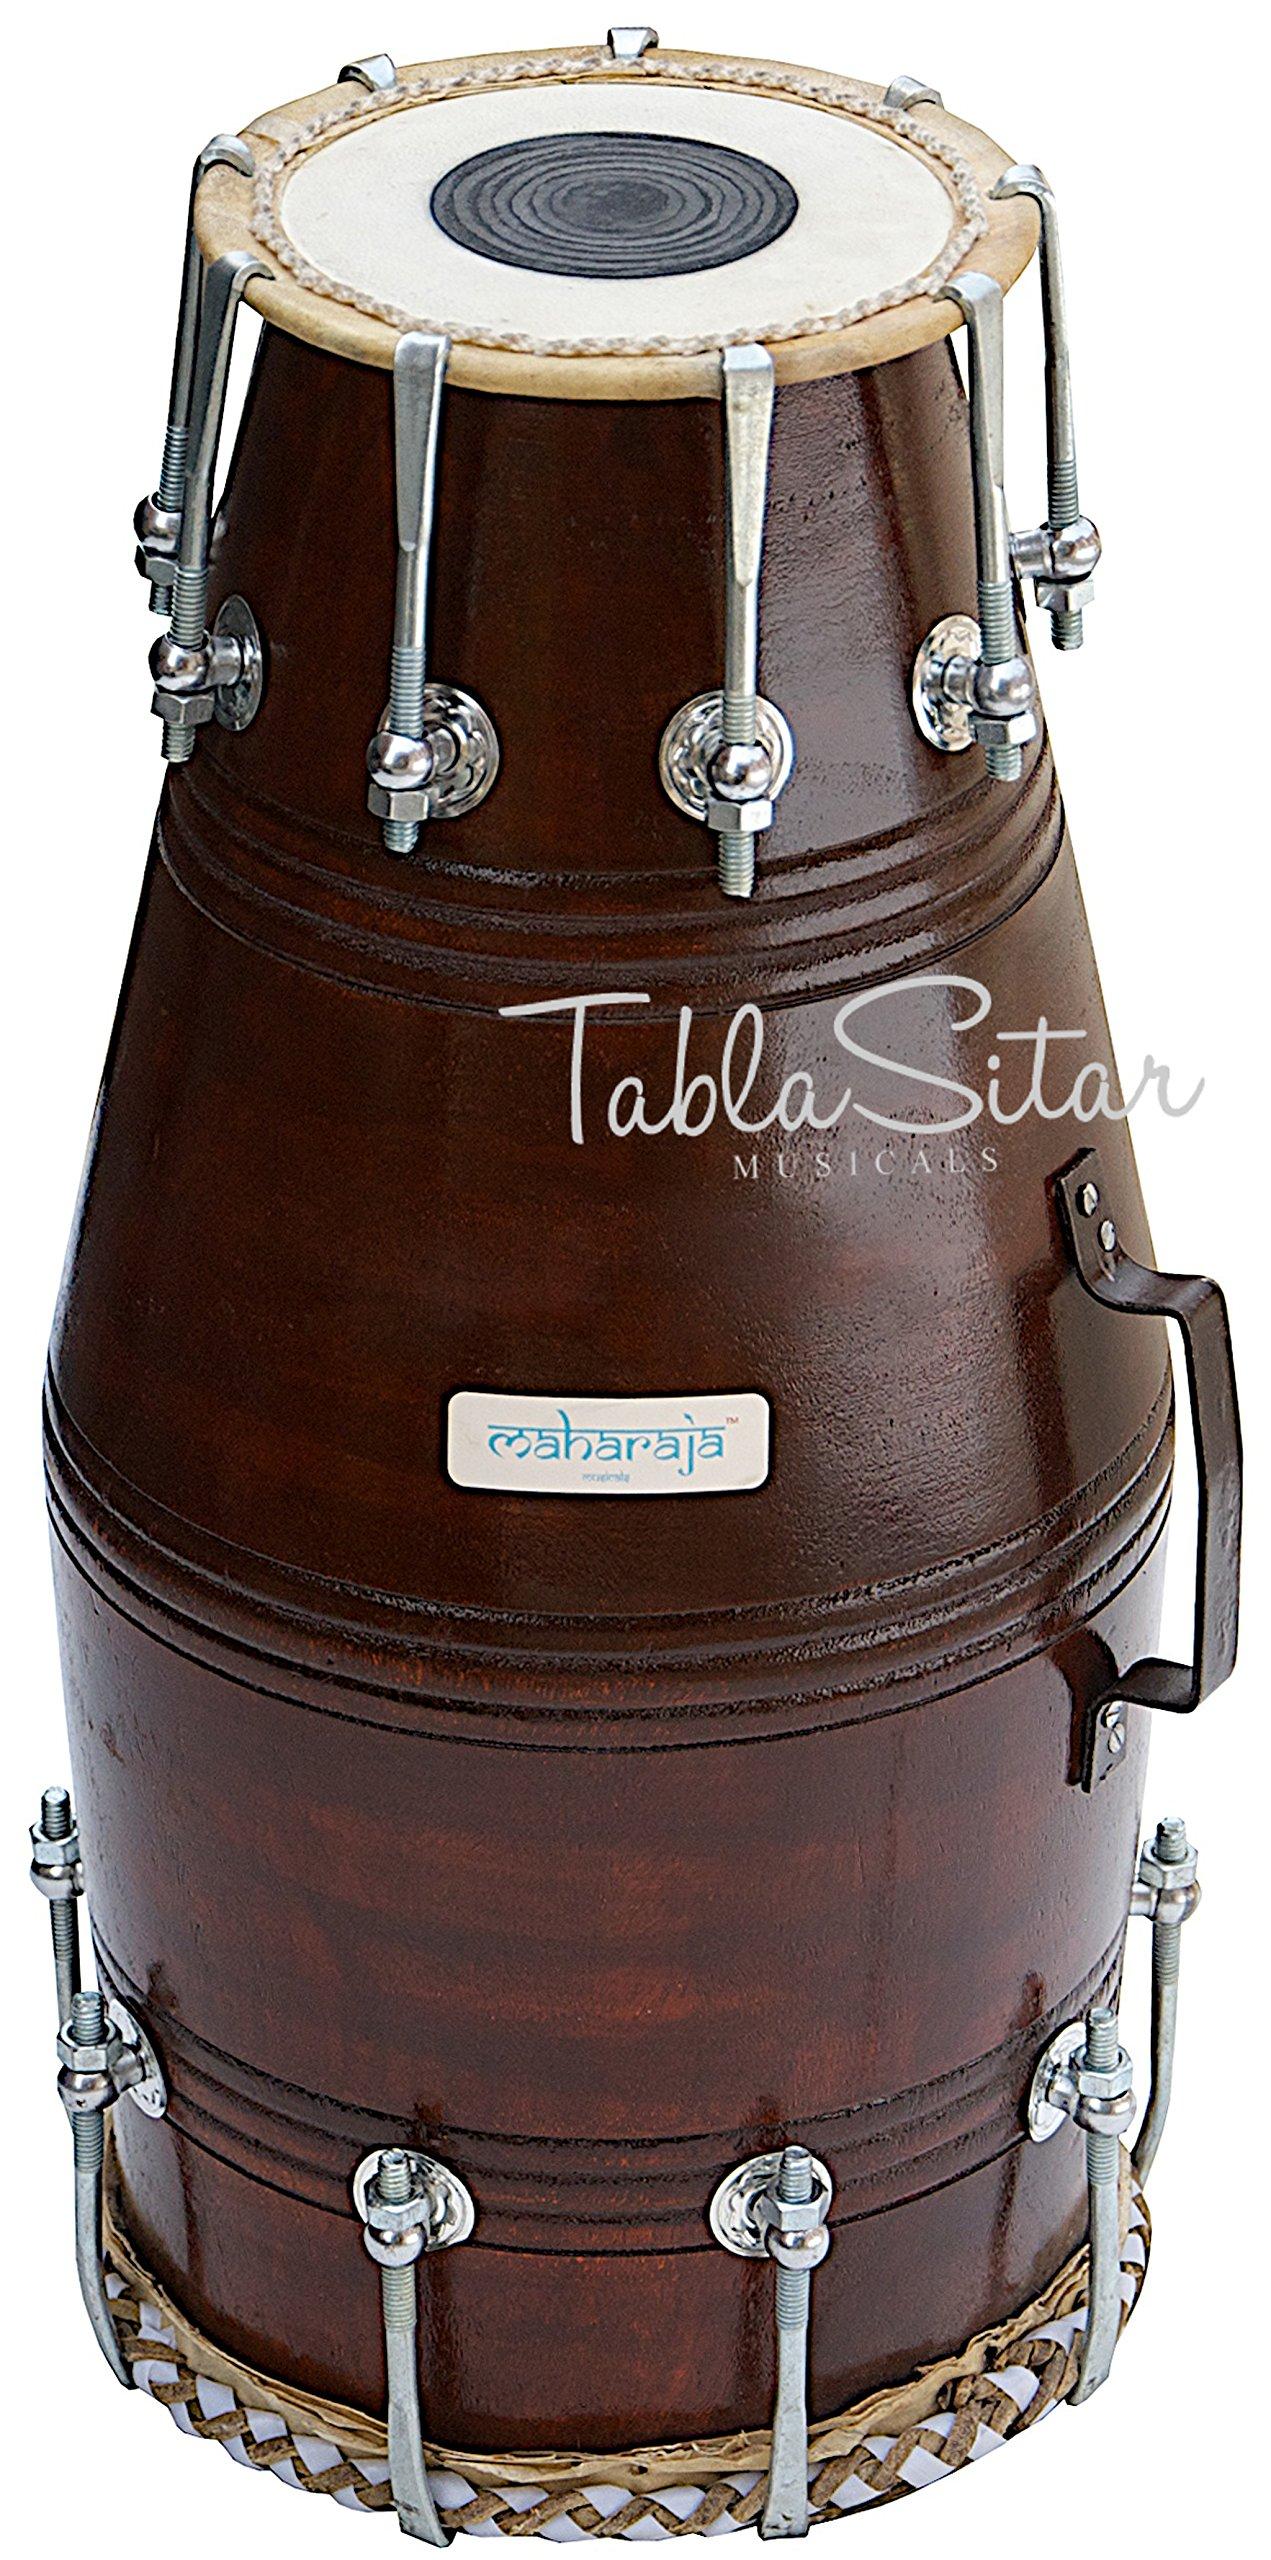 Naal Dholak Drum by Maharaja Musicals, Professional, Sheesham Wood, Bolt-tuned, Padded Bag, Dholak Musical Instrument (PDI-EF)